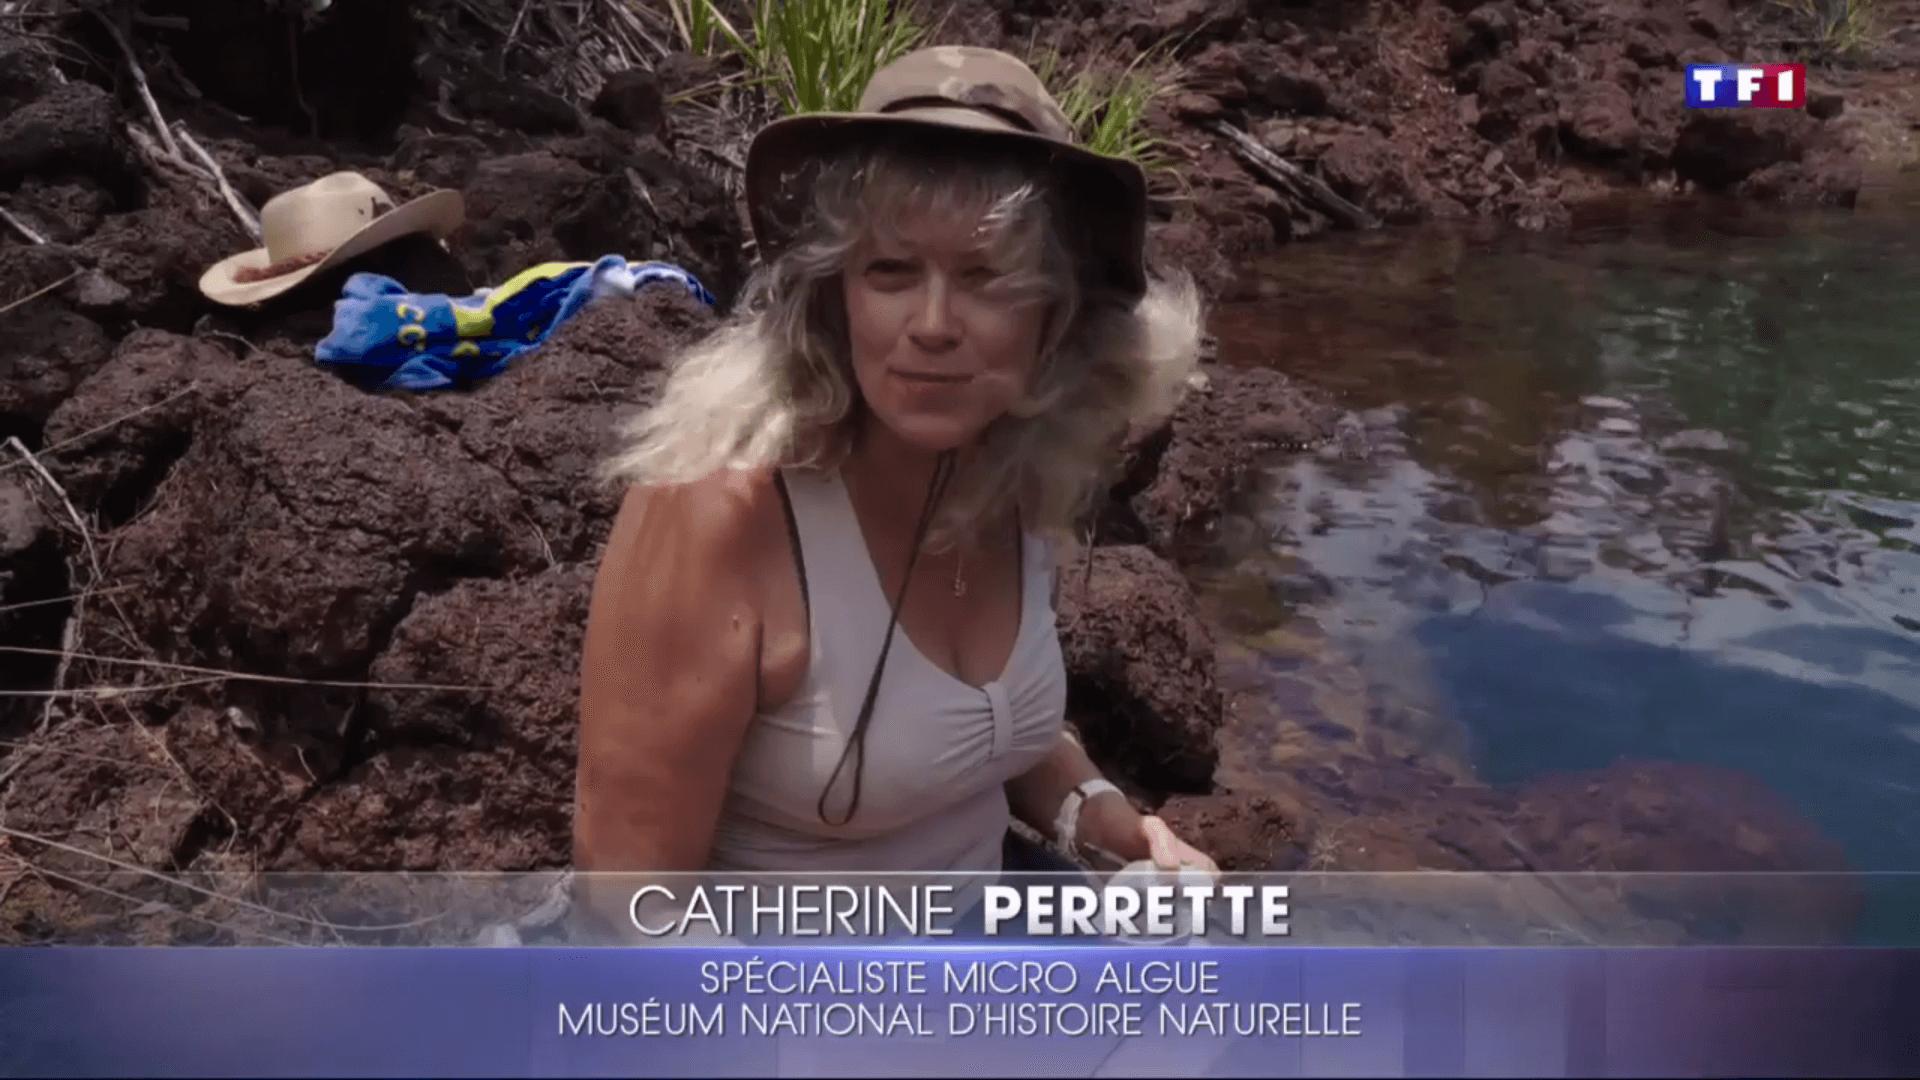 Catherine Perrette au journal télévisé de TF1